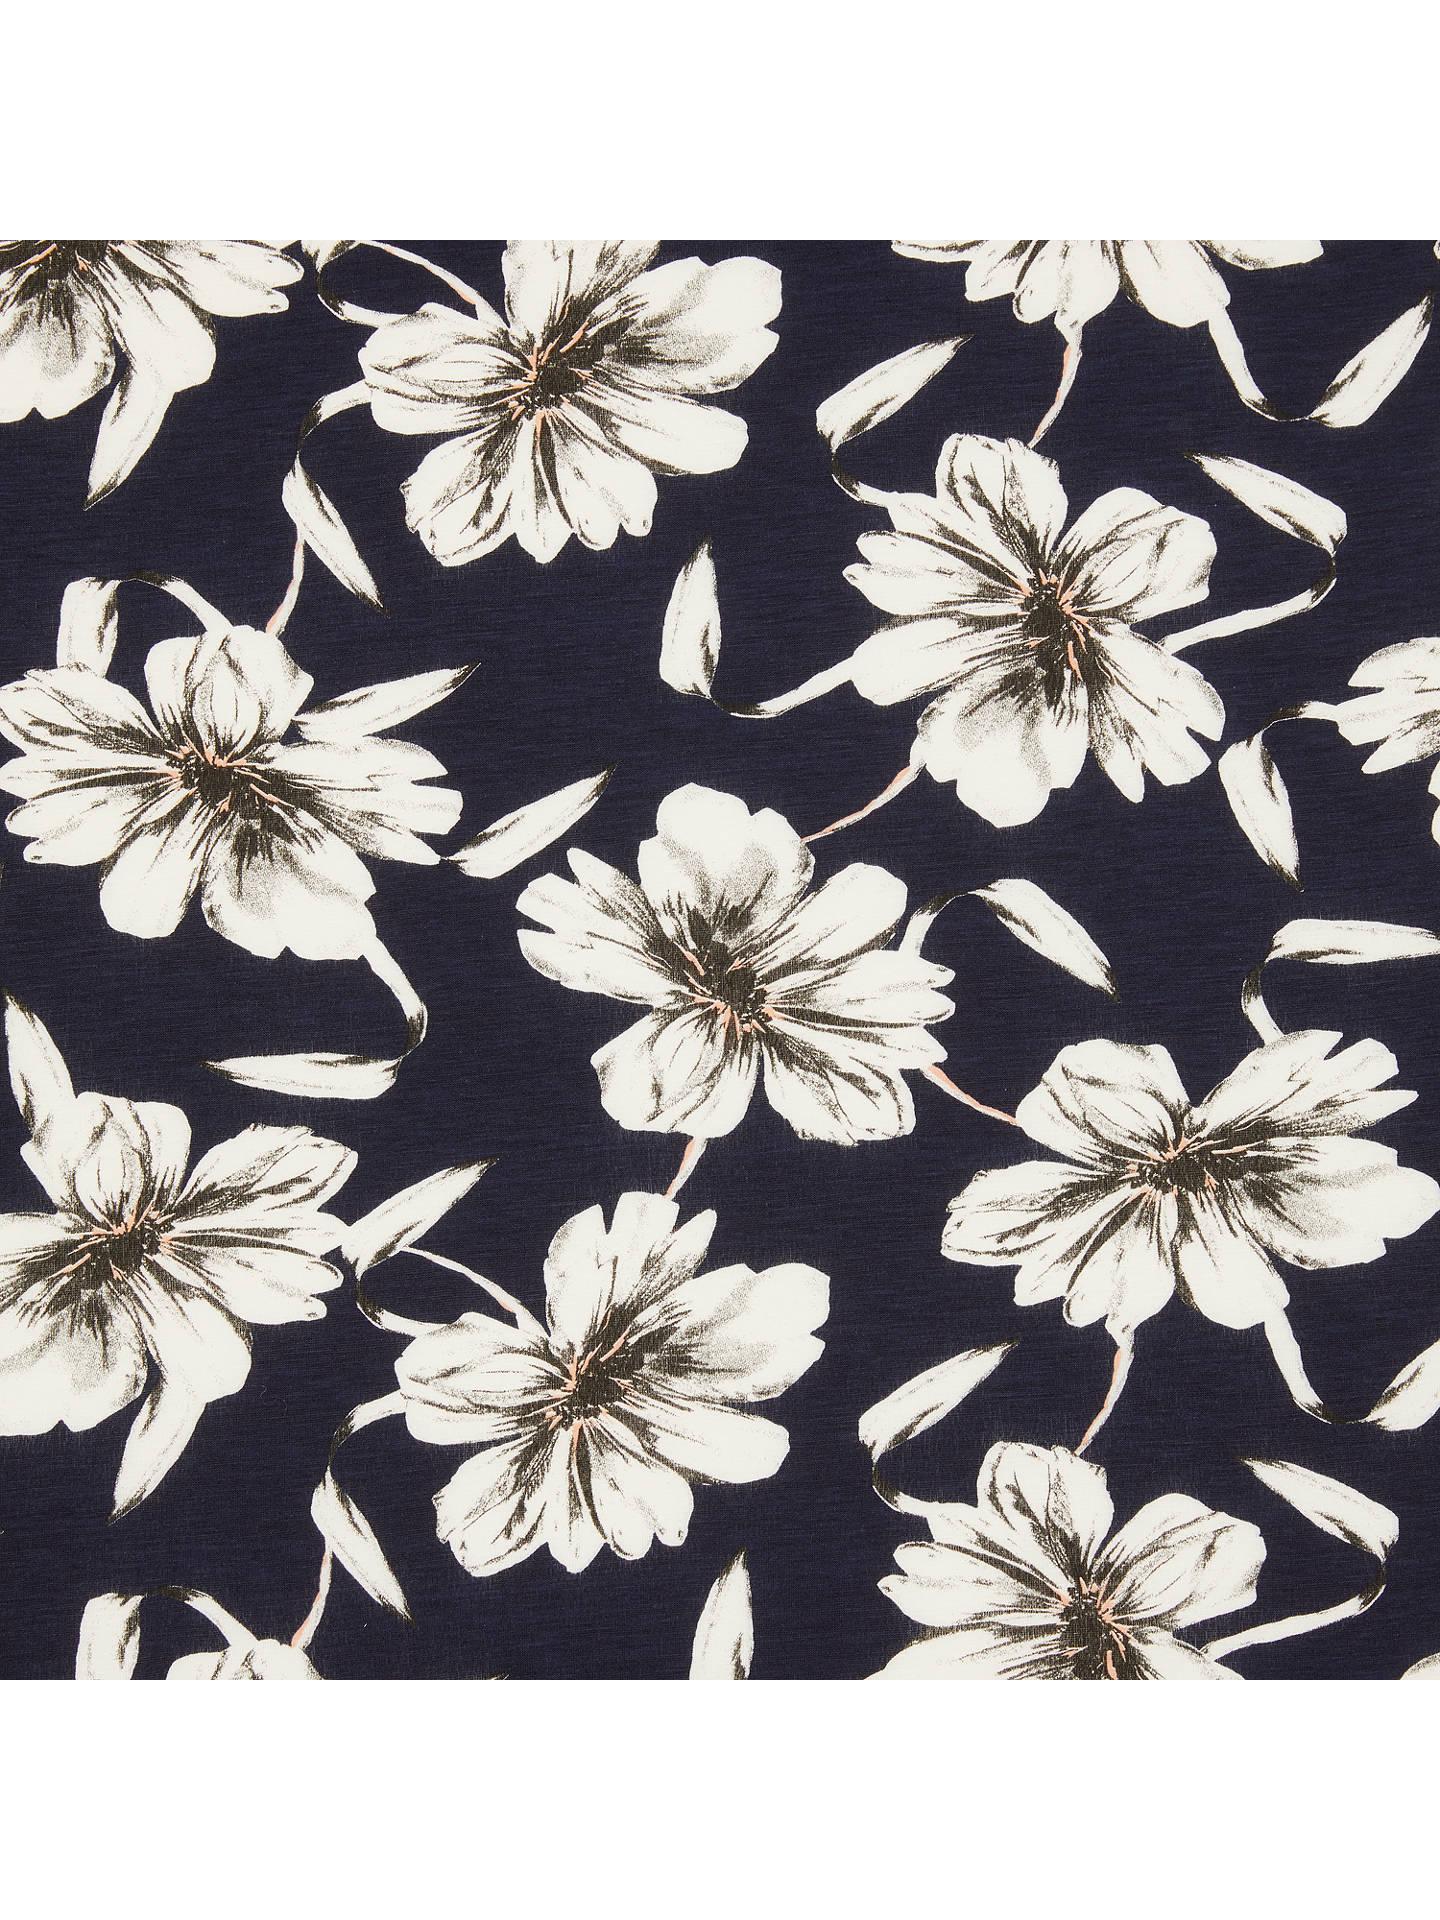 Montreux Fabrics Flower Print Fabric Whitenavy At John Lewis